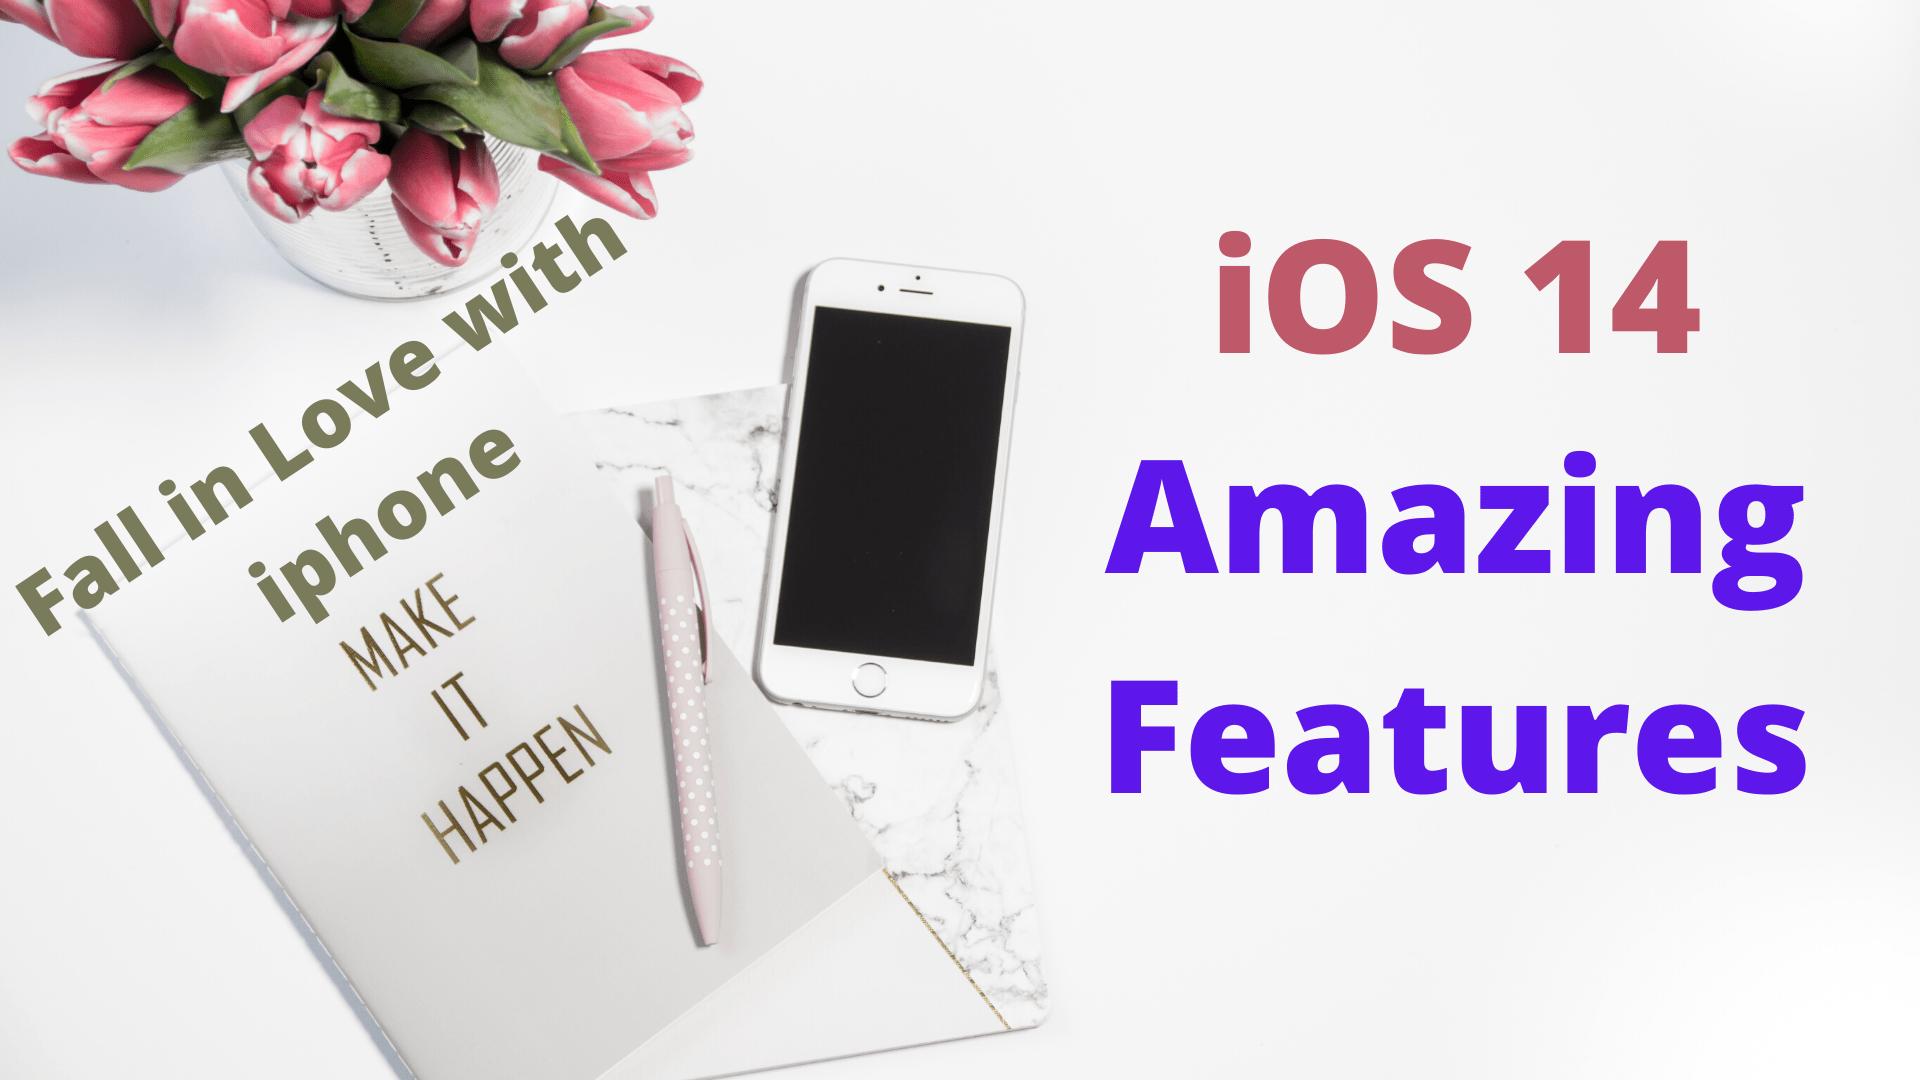 iOS 14 Features